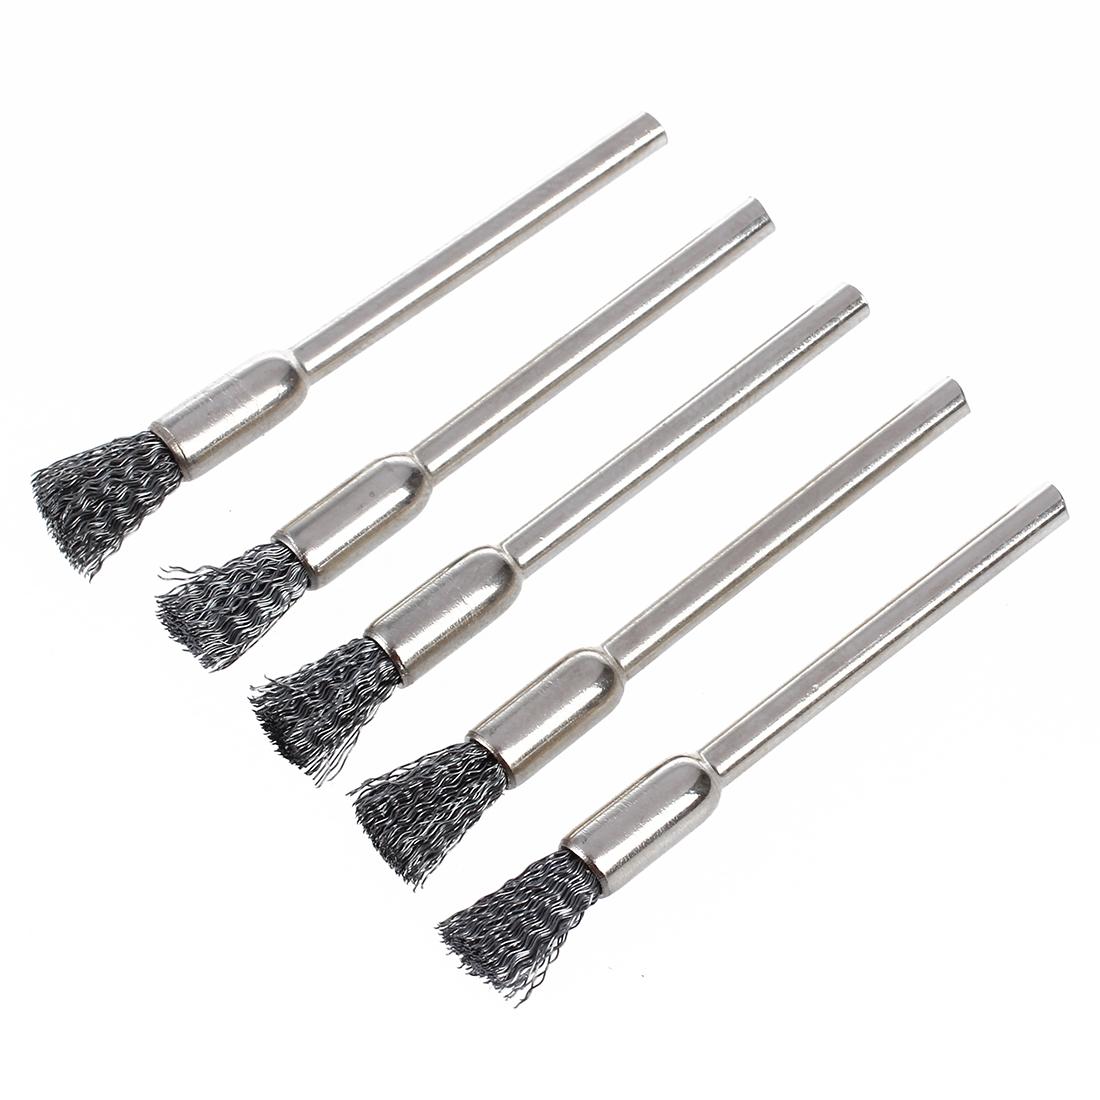 Wire Brush For Drill 3 Mm X 5 J7u9 190268160742 Ebay